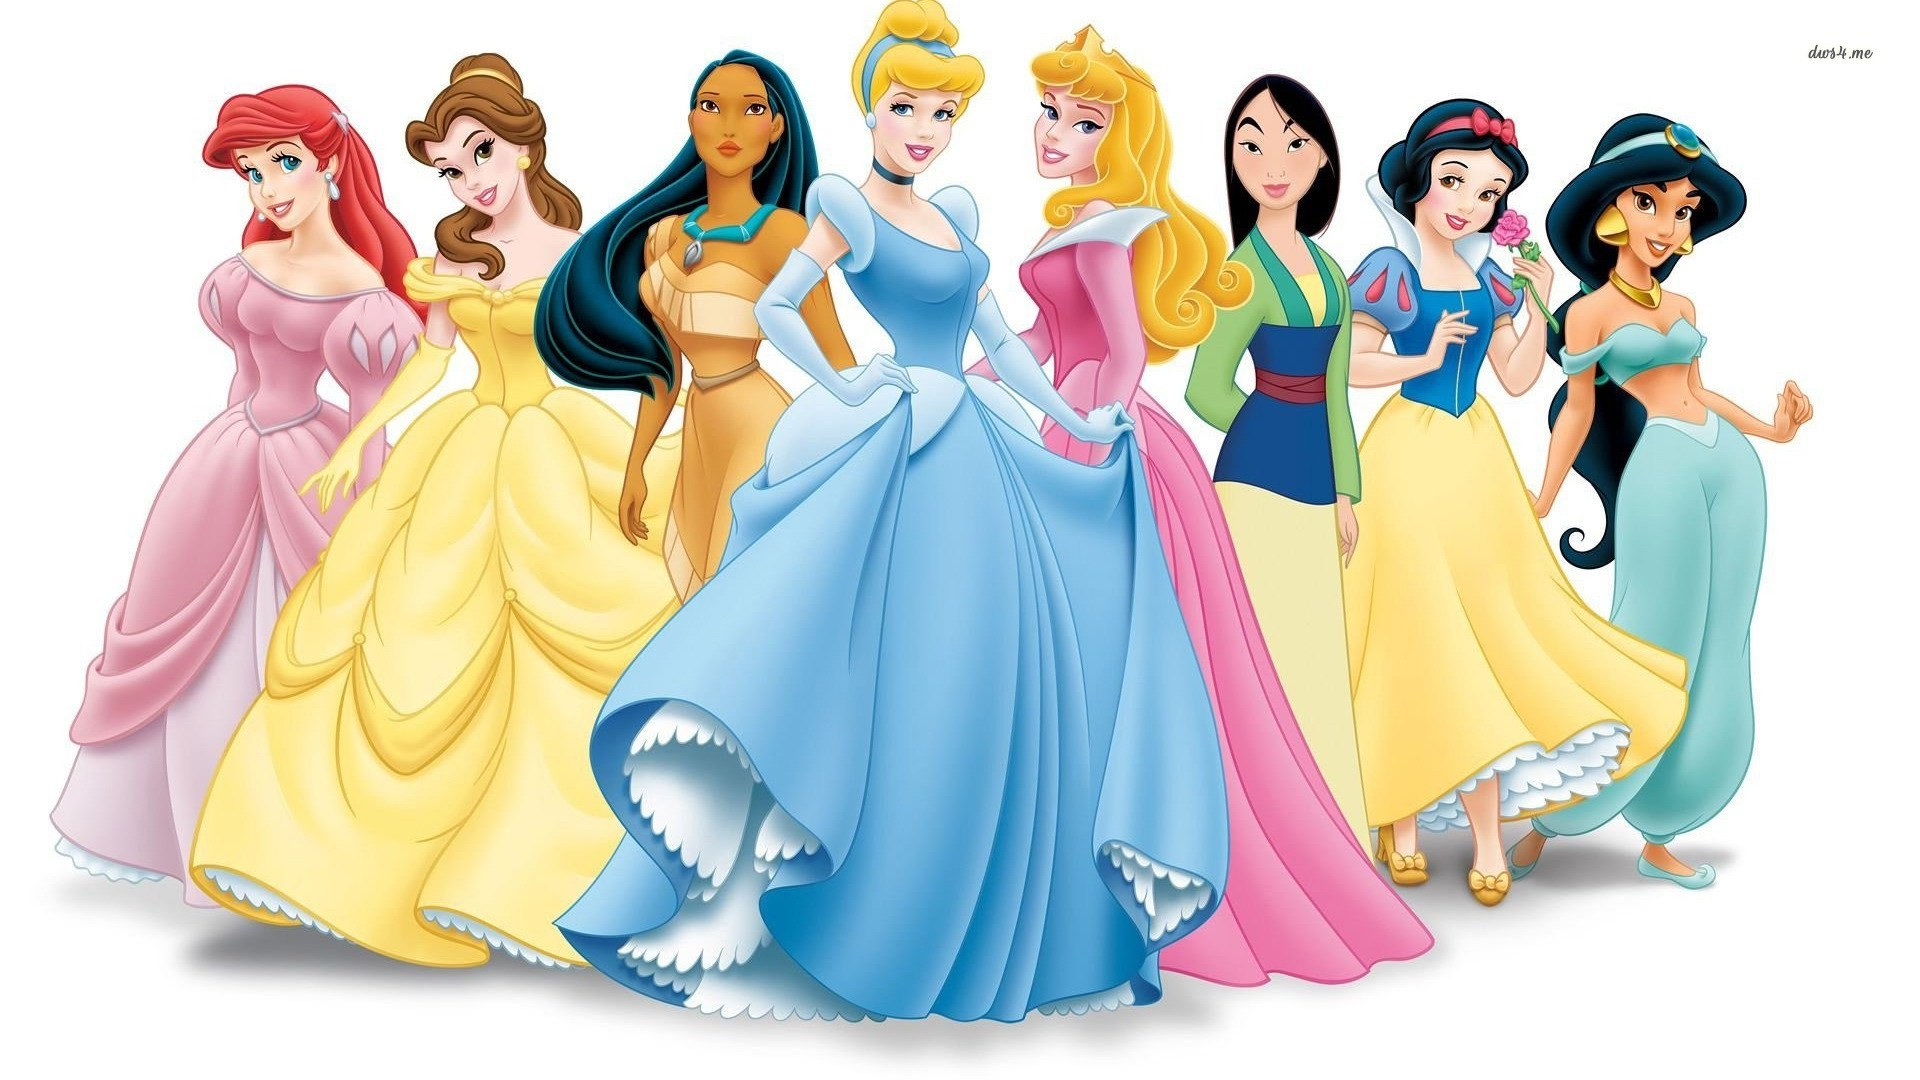 Disney Princess Backgrounds 57 Images